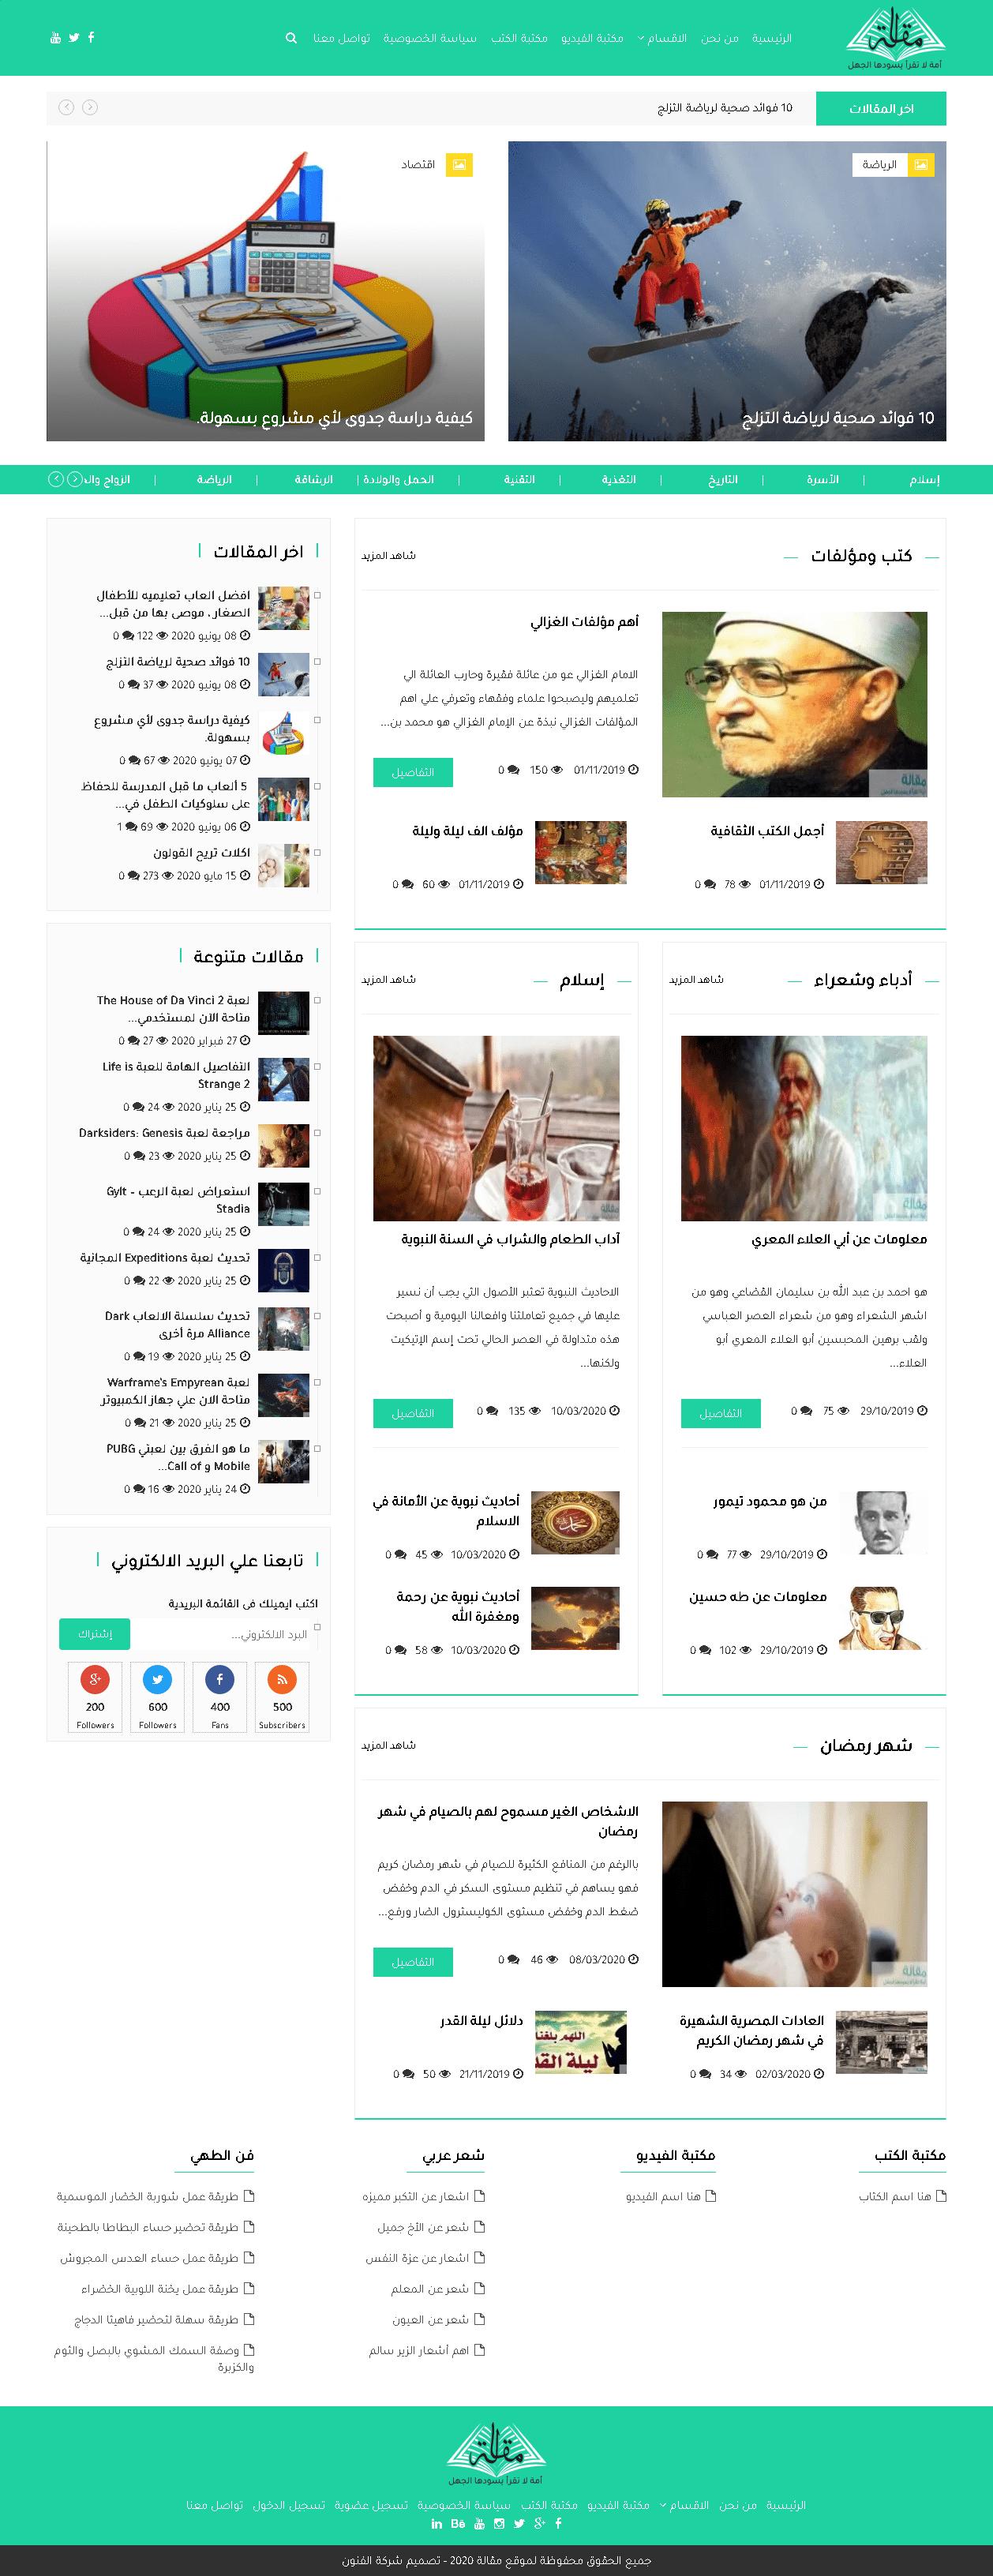 تطوير و انشاء و برمجة و تصميم موقع مقالات